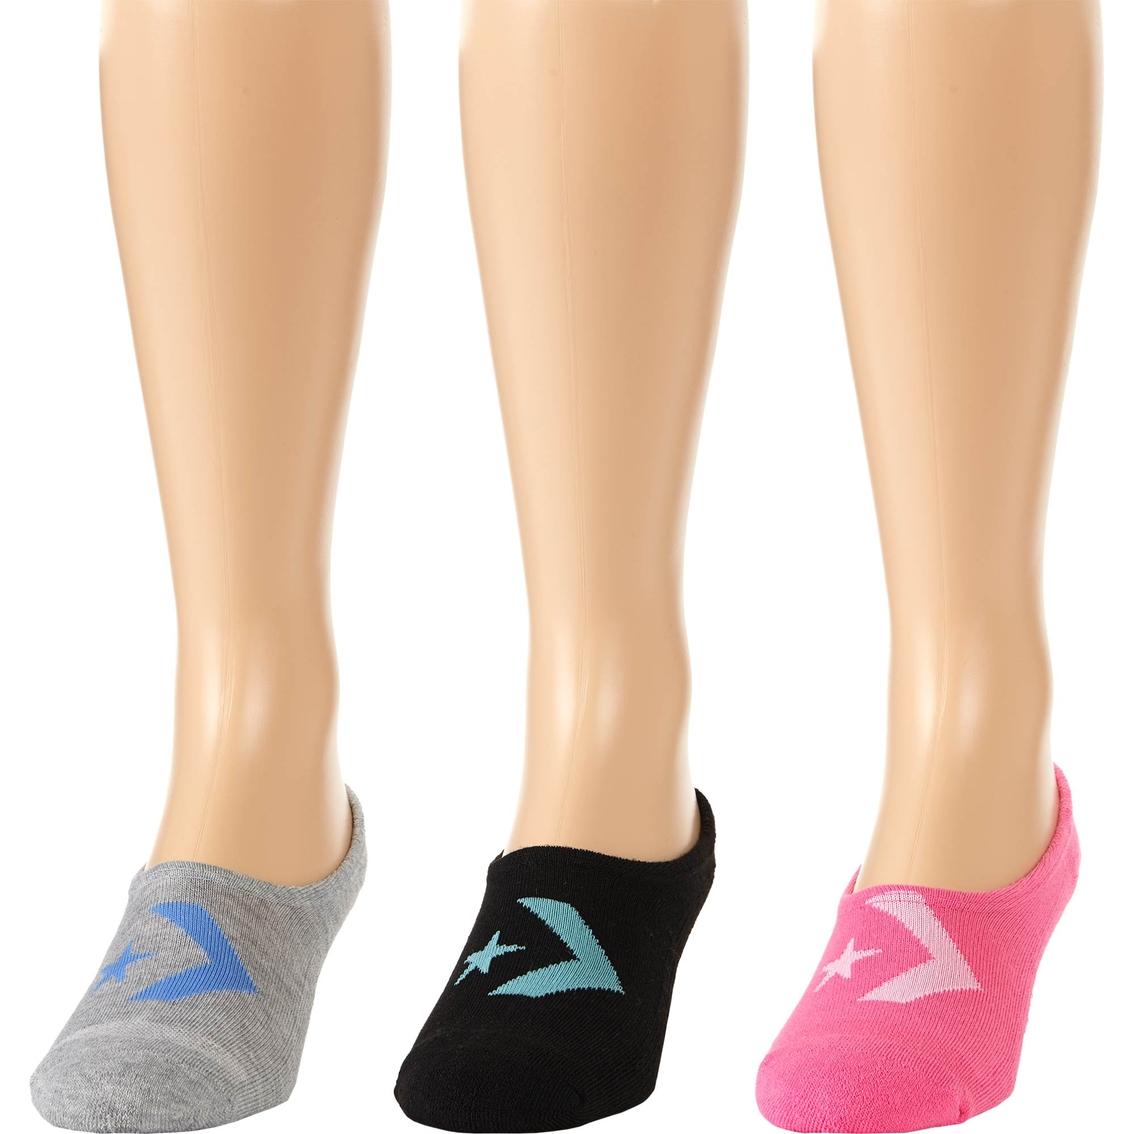 f0febb5c22d0 Converse Women s Made for Chucks Chevron Ultra Low Hidden Liner Socks 3 Pk.